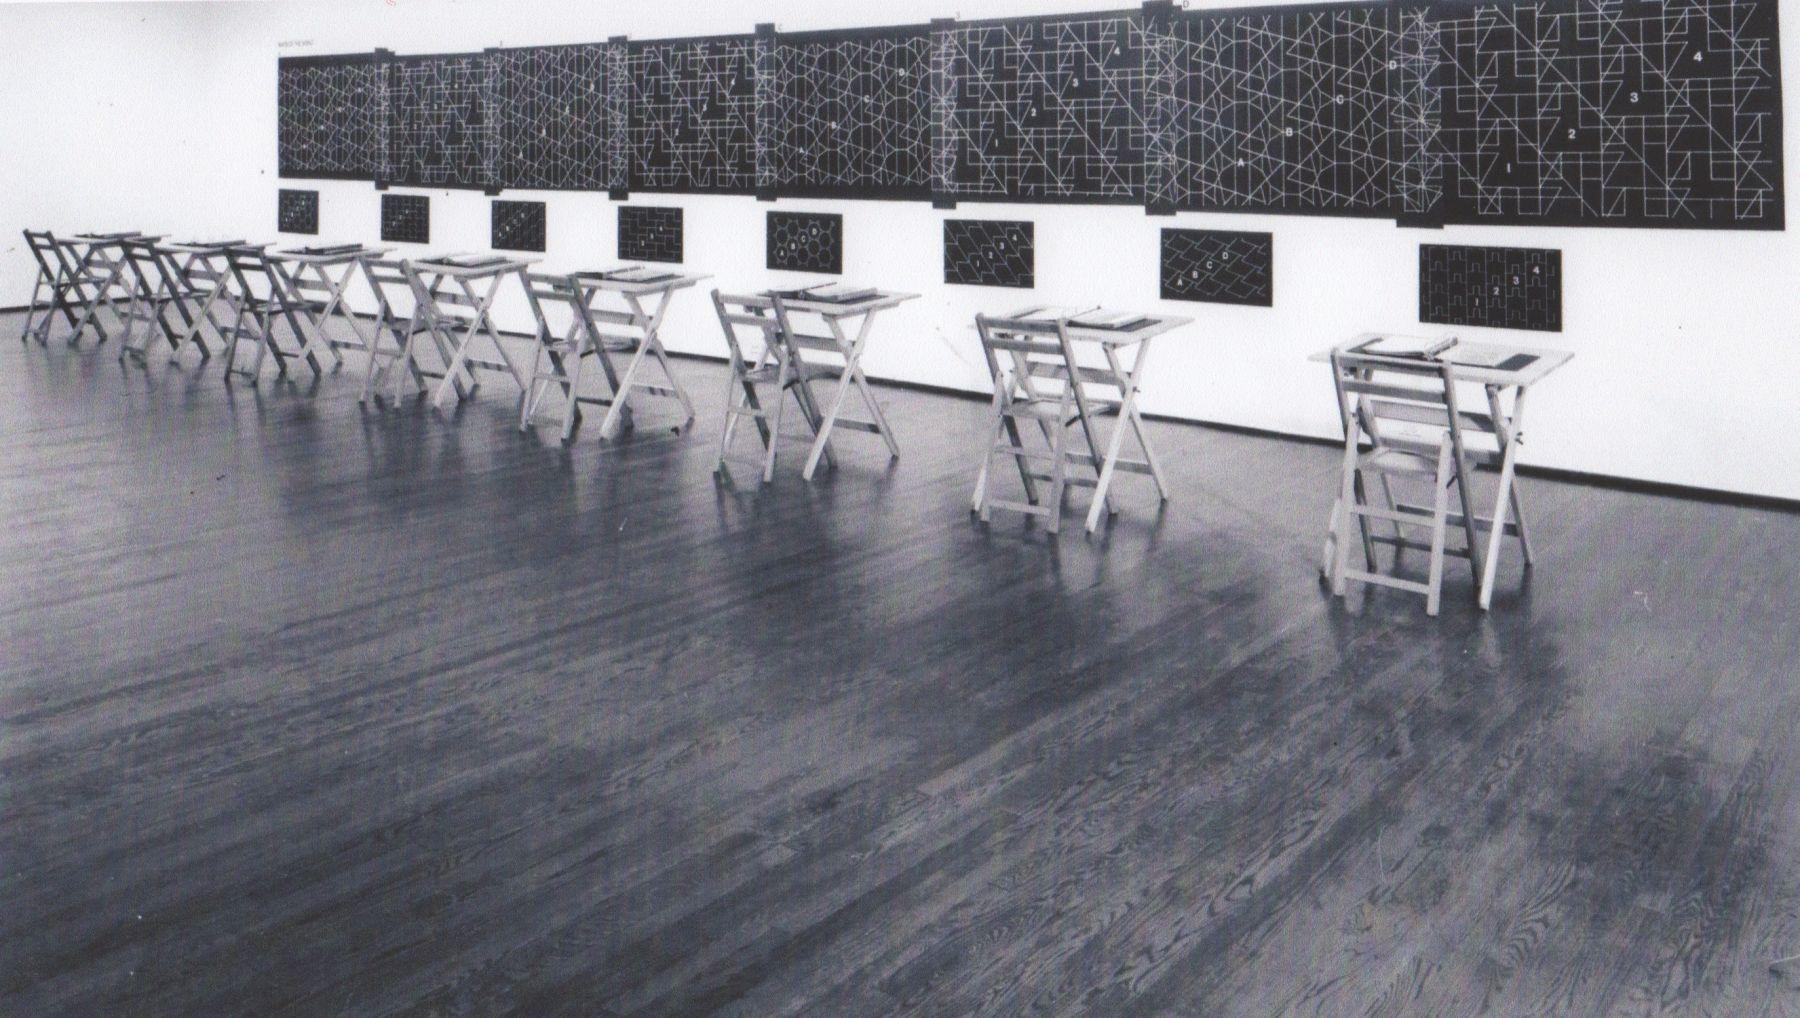 Installation view, Joseph Kosuth: Tenth Investigation, Position Four, 420 WEST BROADWAY